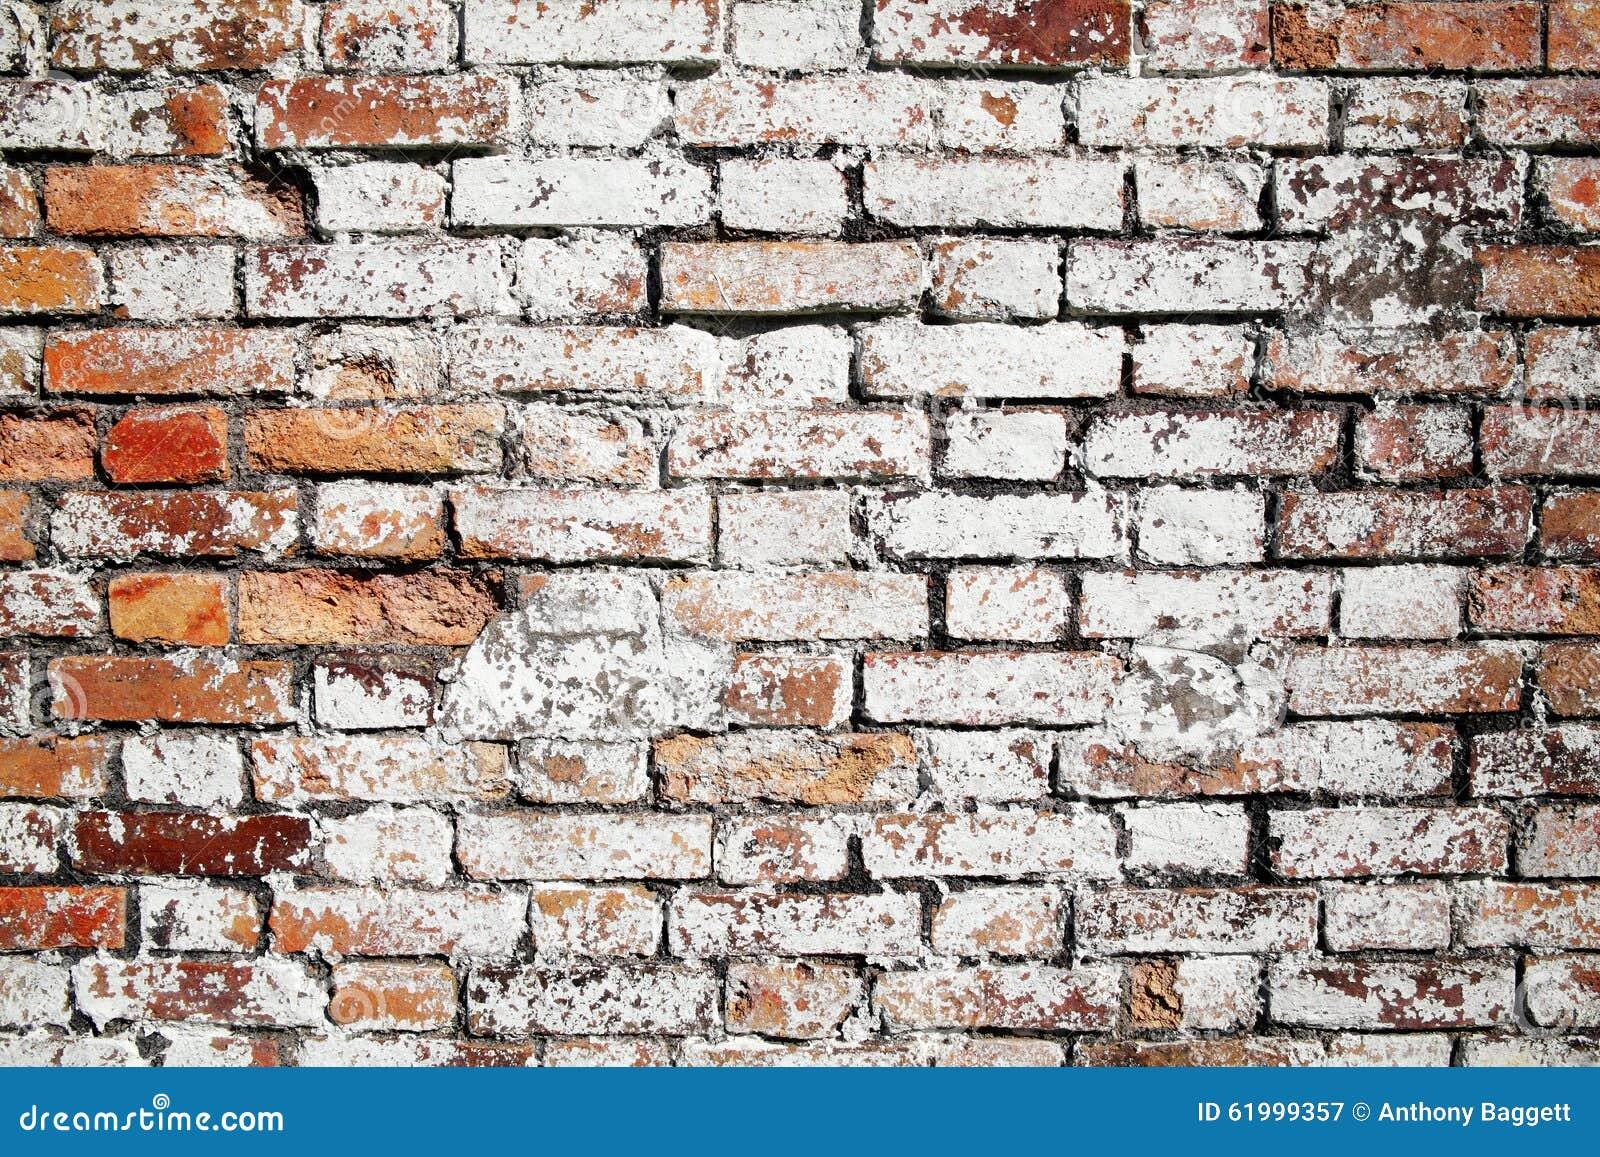 Royalty Free Stock Photo  Download Brick wall. Brick wall background stock image  Image of abstract   61999357